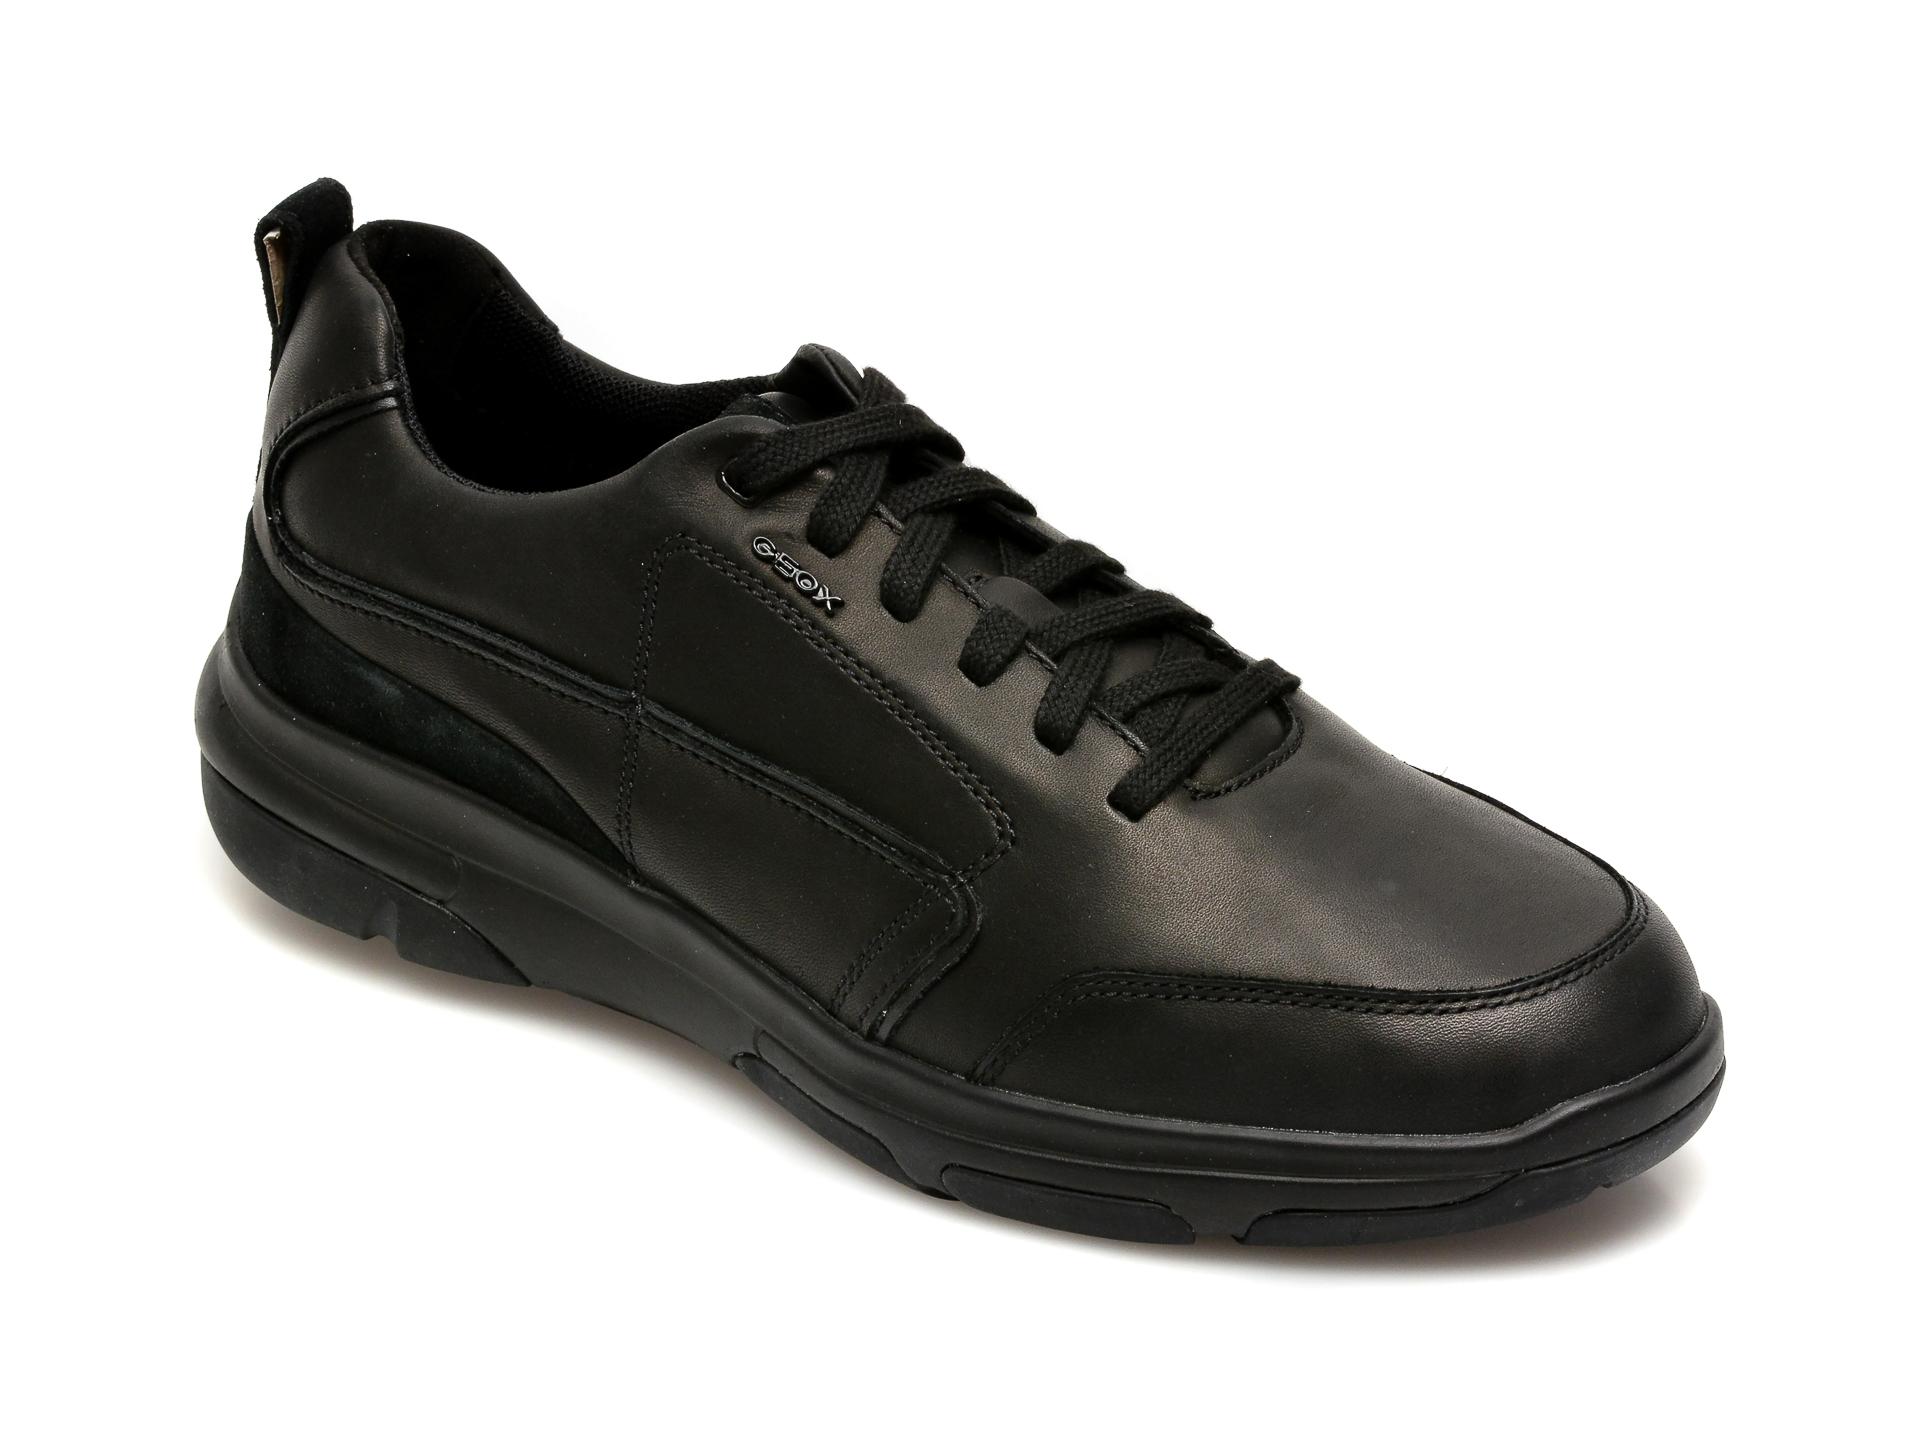 Pantofi sport GEOX negri, U150EB, din piele naturala